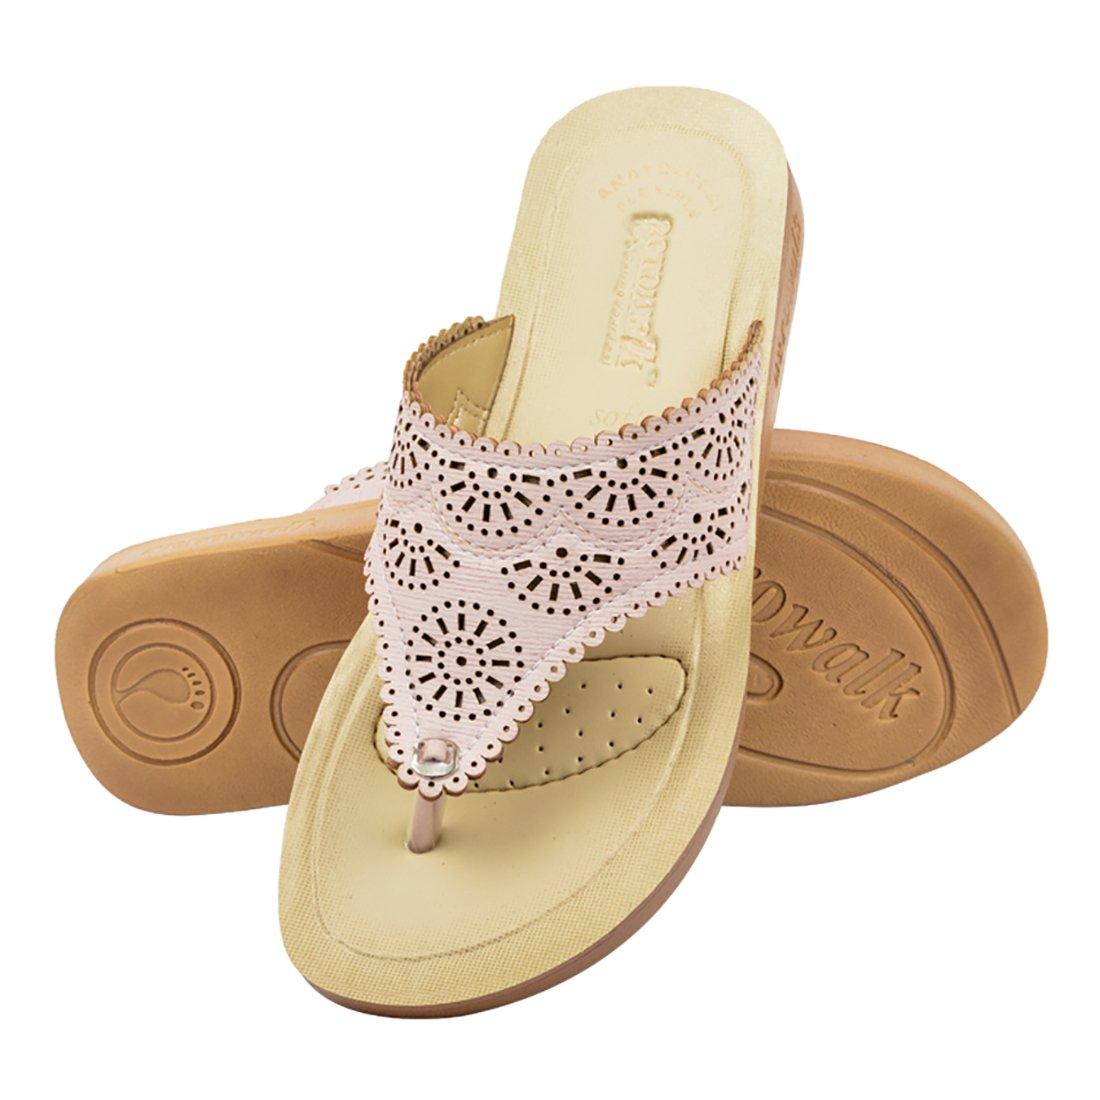 Buy AEROWALK Womens Sandals Casual use